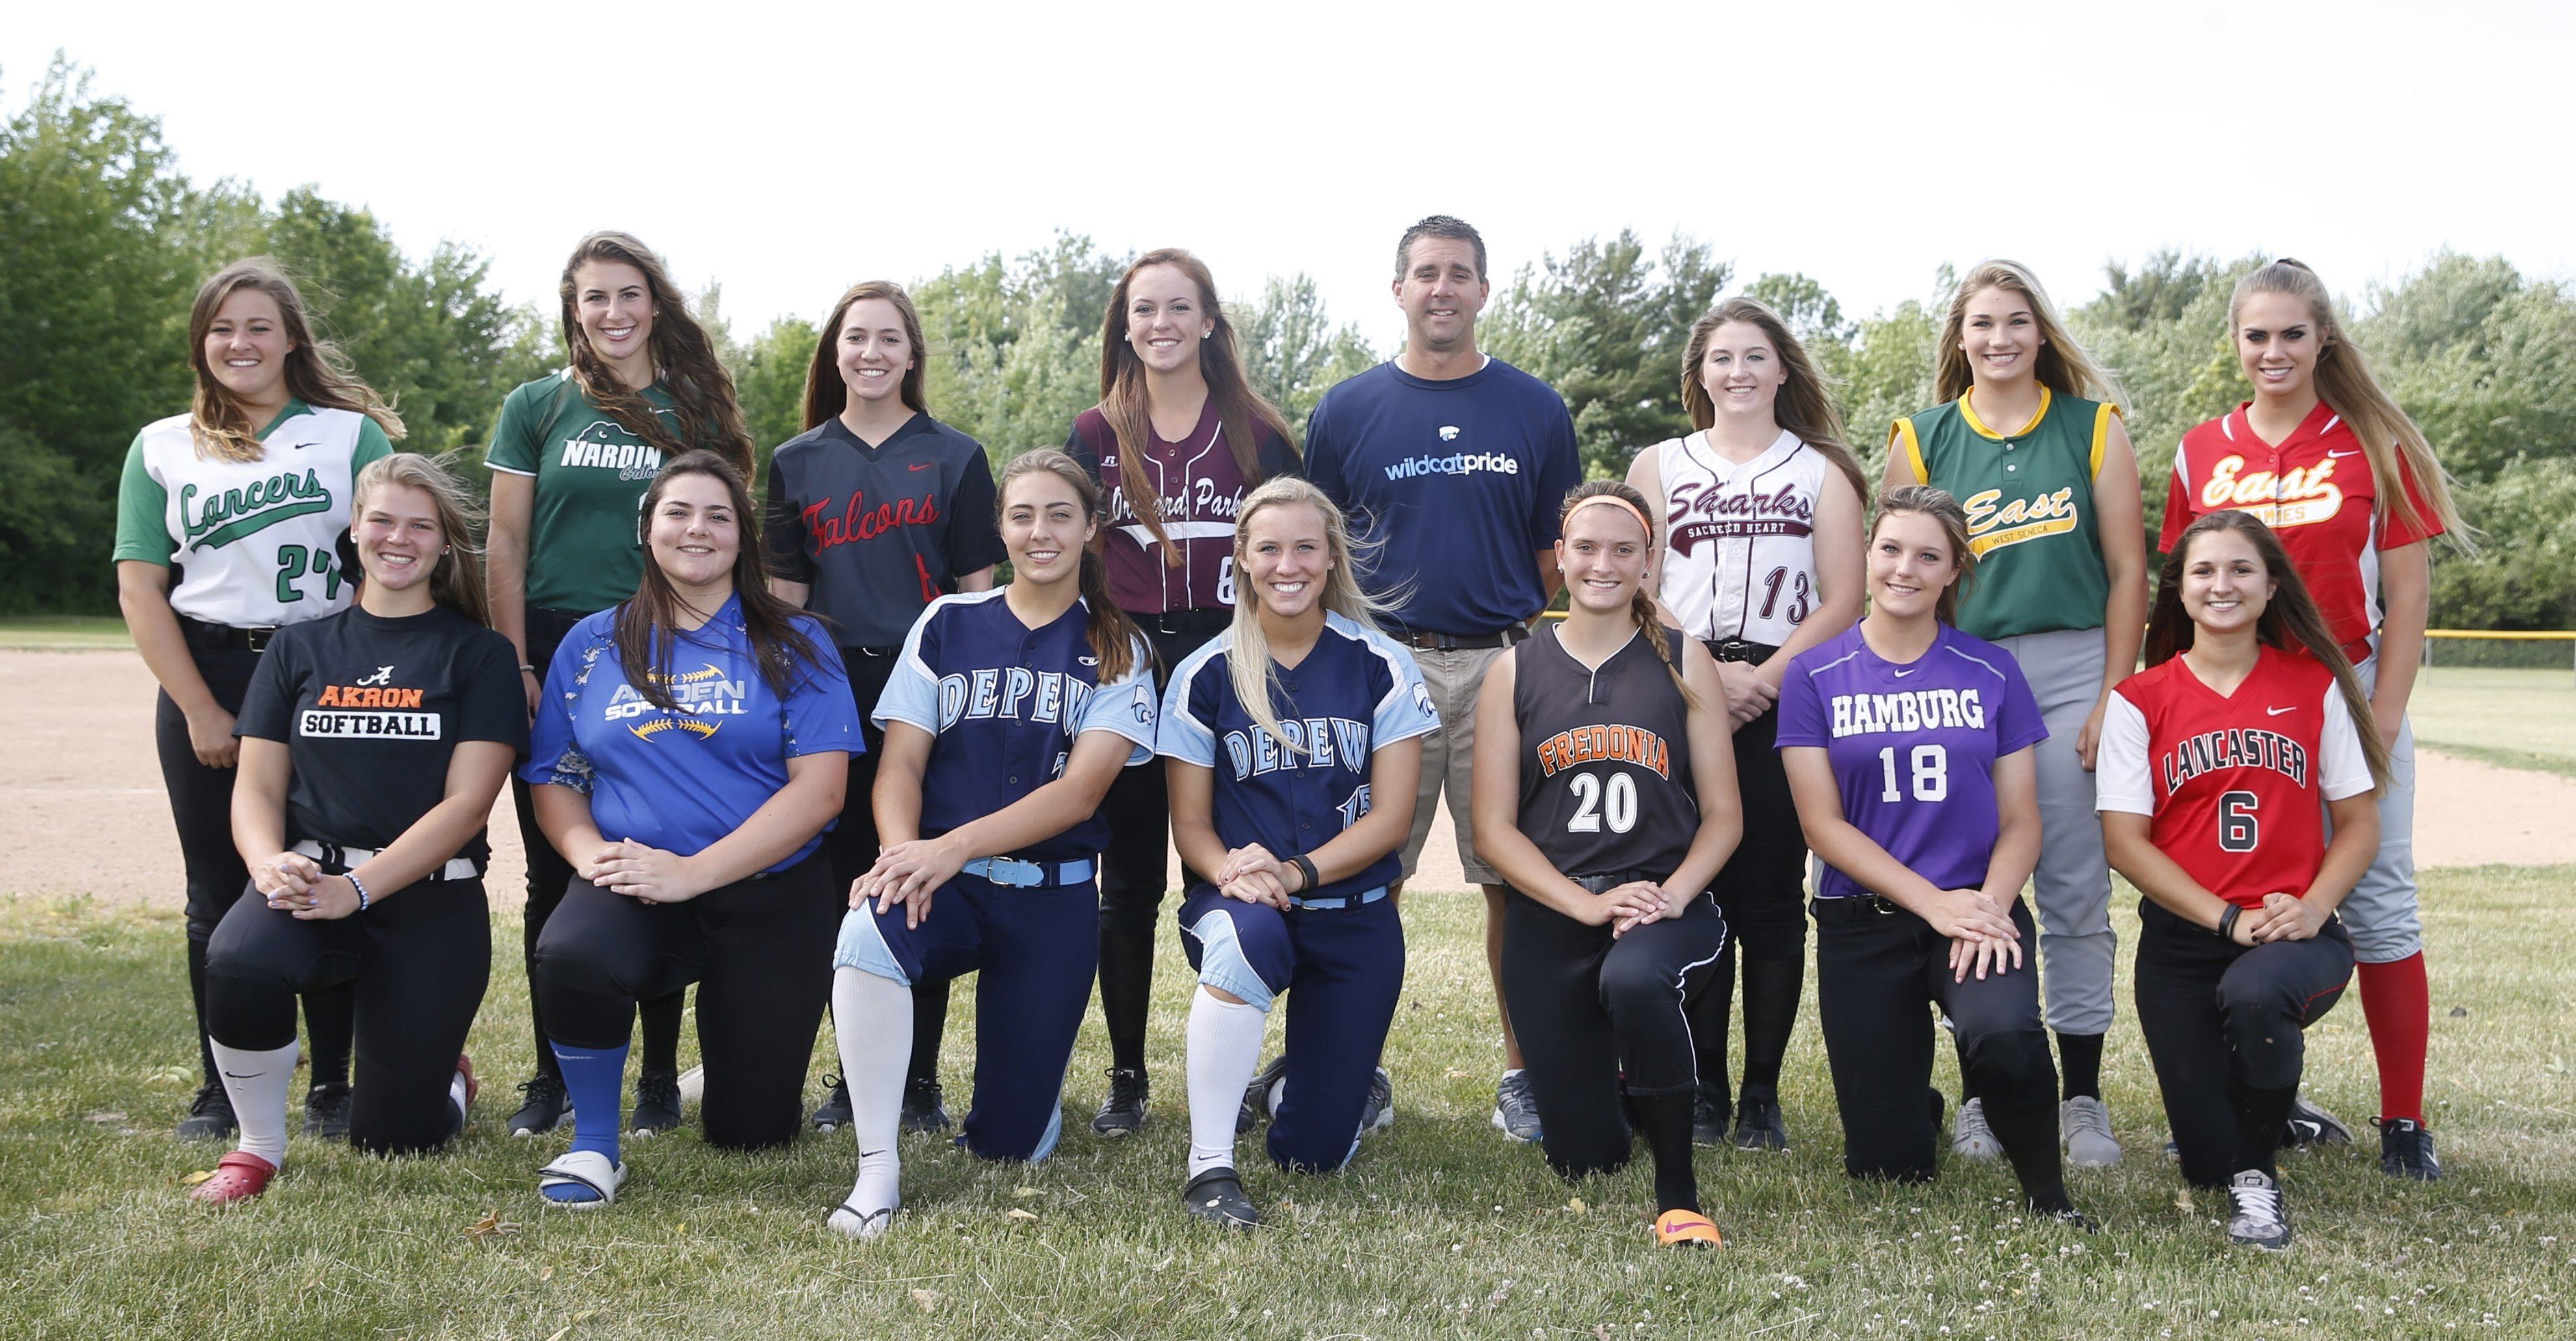 The 2016 All-Western New York Softball Team: Front row (left to right) -- Abby Stone, Akron; Laura Kratzke, Alden; Karsen Cotton, Depew; Abby Nicometi, Depew; Hannah Cybart, Fredonia; Heather Haberman, Hamburg; Kara Paradowski, Lancaster. Back row (L-R) -- Jenna Rhue, Lew-Port; Rachael Perelstein, Nardin; Madison Klidonas, Niagara Wheatfield; Madison Stewart, Orchard Park; Dan Seelig, Depew, Coach of the Year; Shannon Gilbert, Sacred Heart; Anilese Kelly, West Seneca East; Christy Mack, Williamsville East.